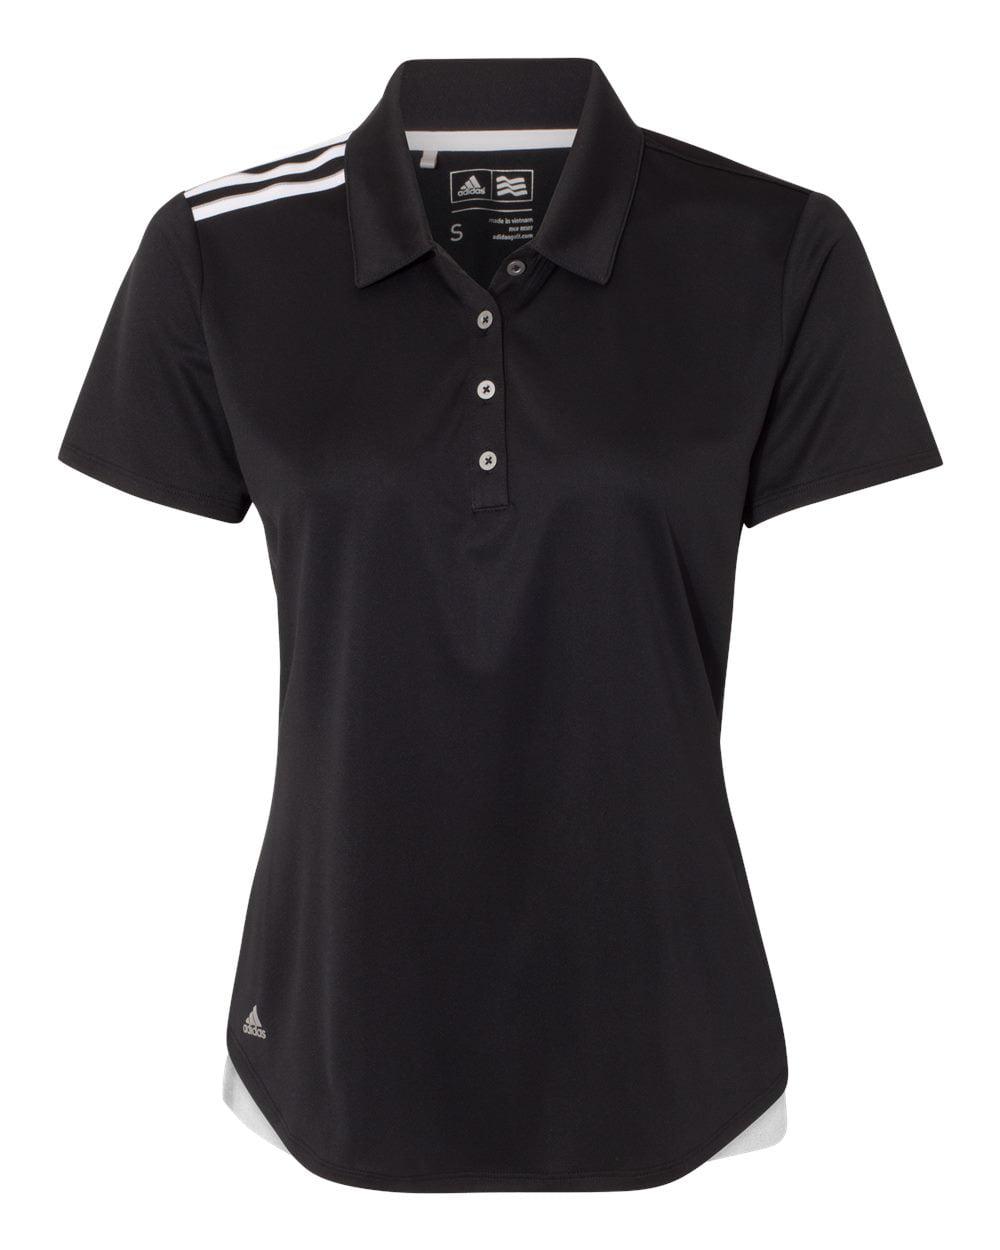 a5370586cca6d Adidas a women stripes polo shirt black white grey jpg 450x450 Black and white  womens striped